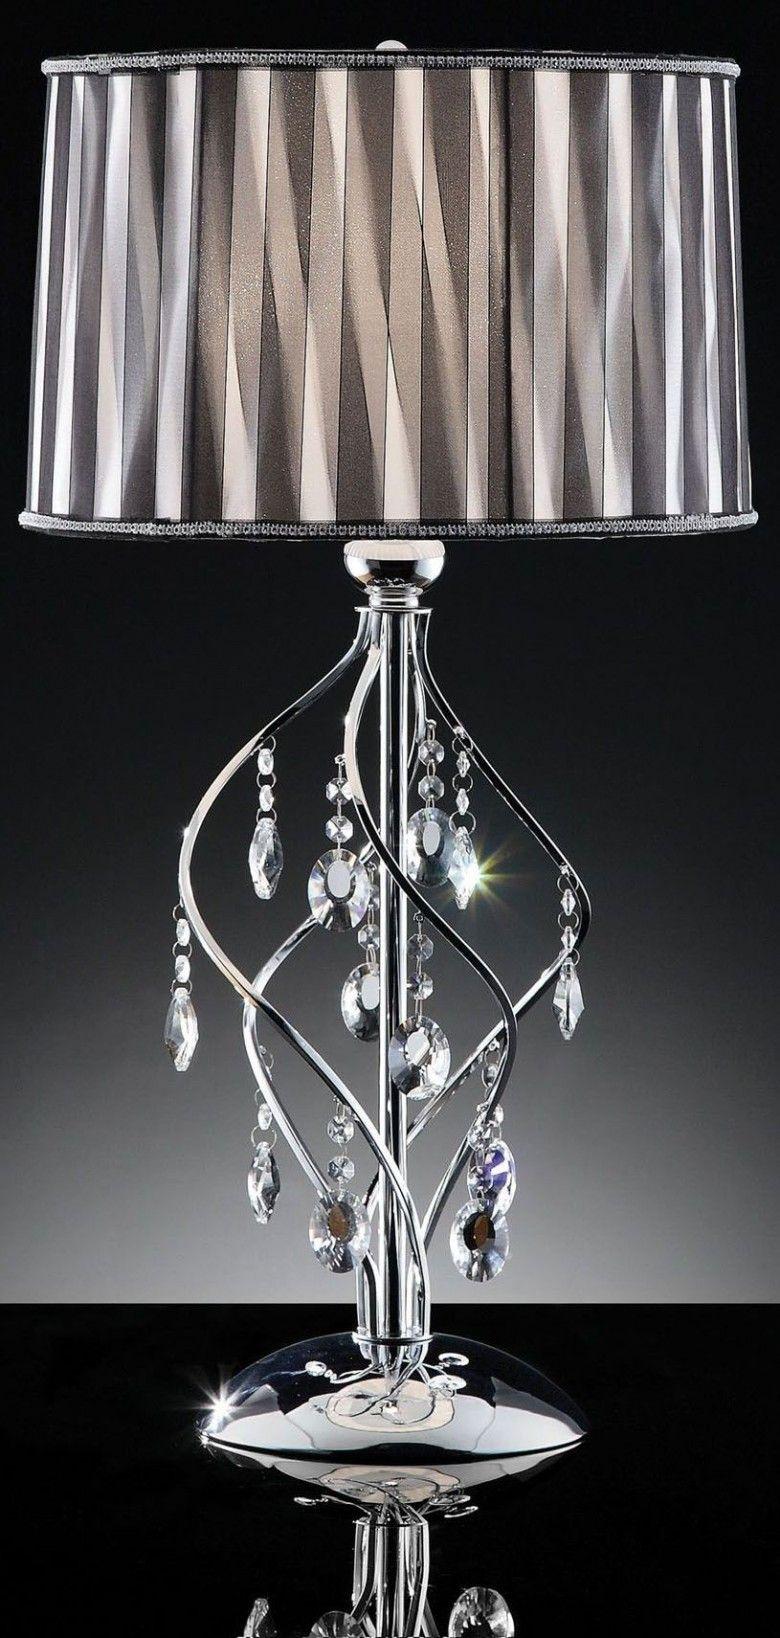 Bejeweled lamp shade | Beaded lamps